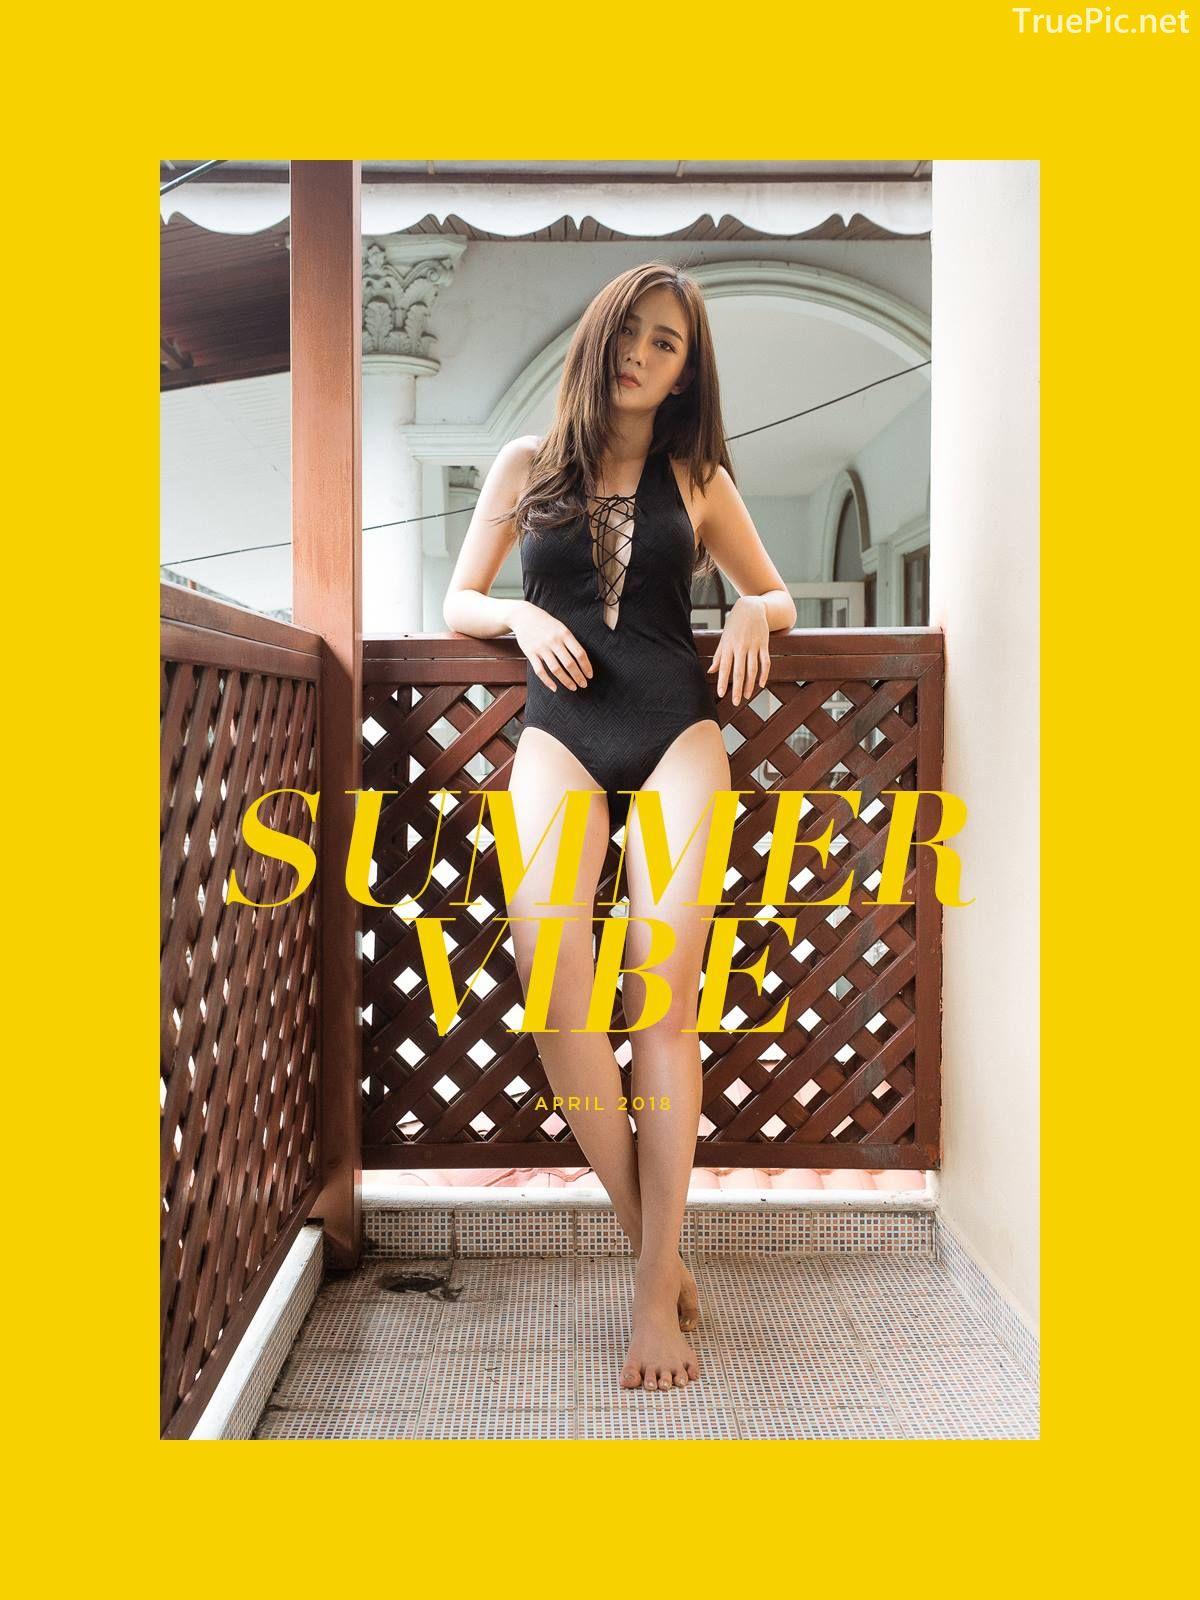 Thailand hot model Rossarin Klinhom - Photo album Summer Vibe - TruePic.net- Picture 1